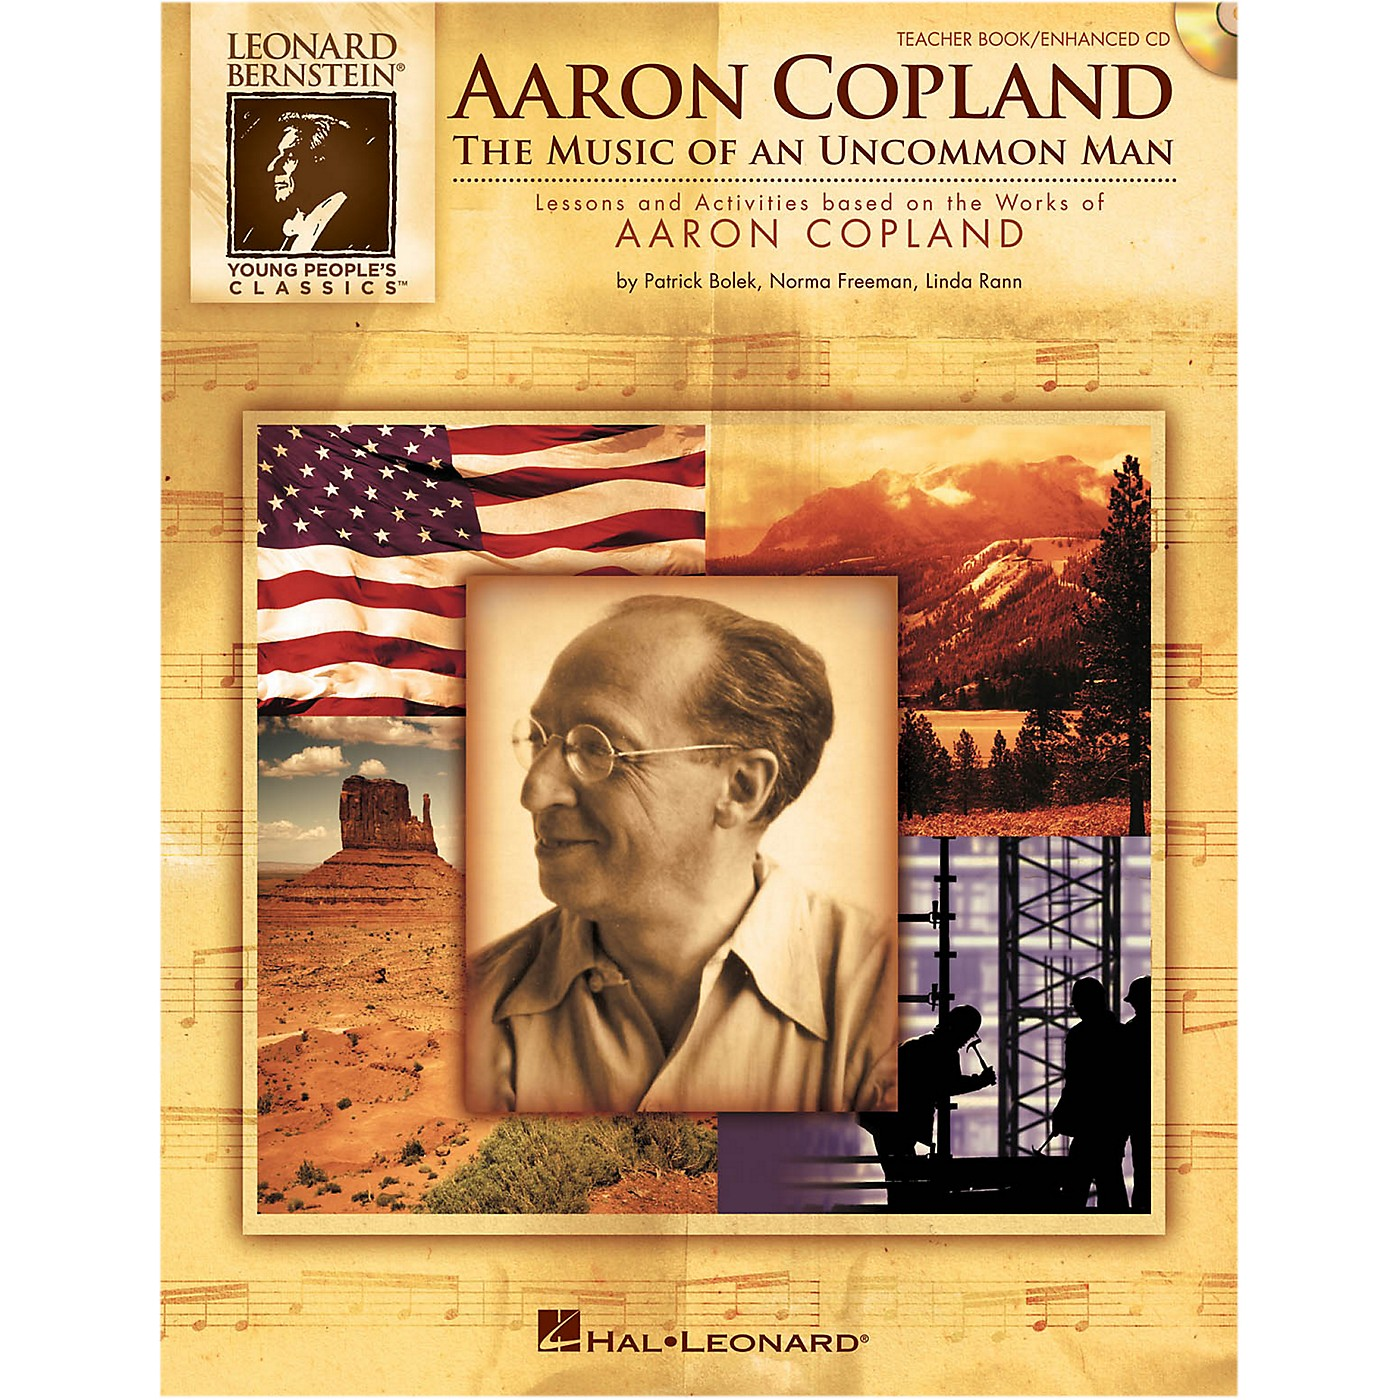 Hal Leonard Aaron Copland: The Music Of An Uncommon Man Classroom Kit thumbnail